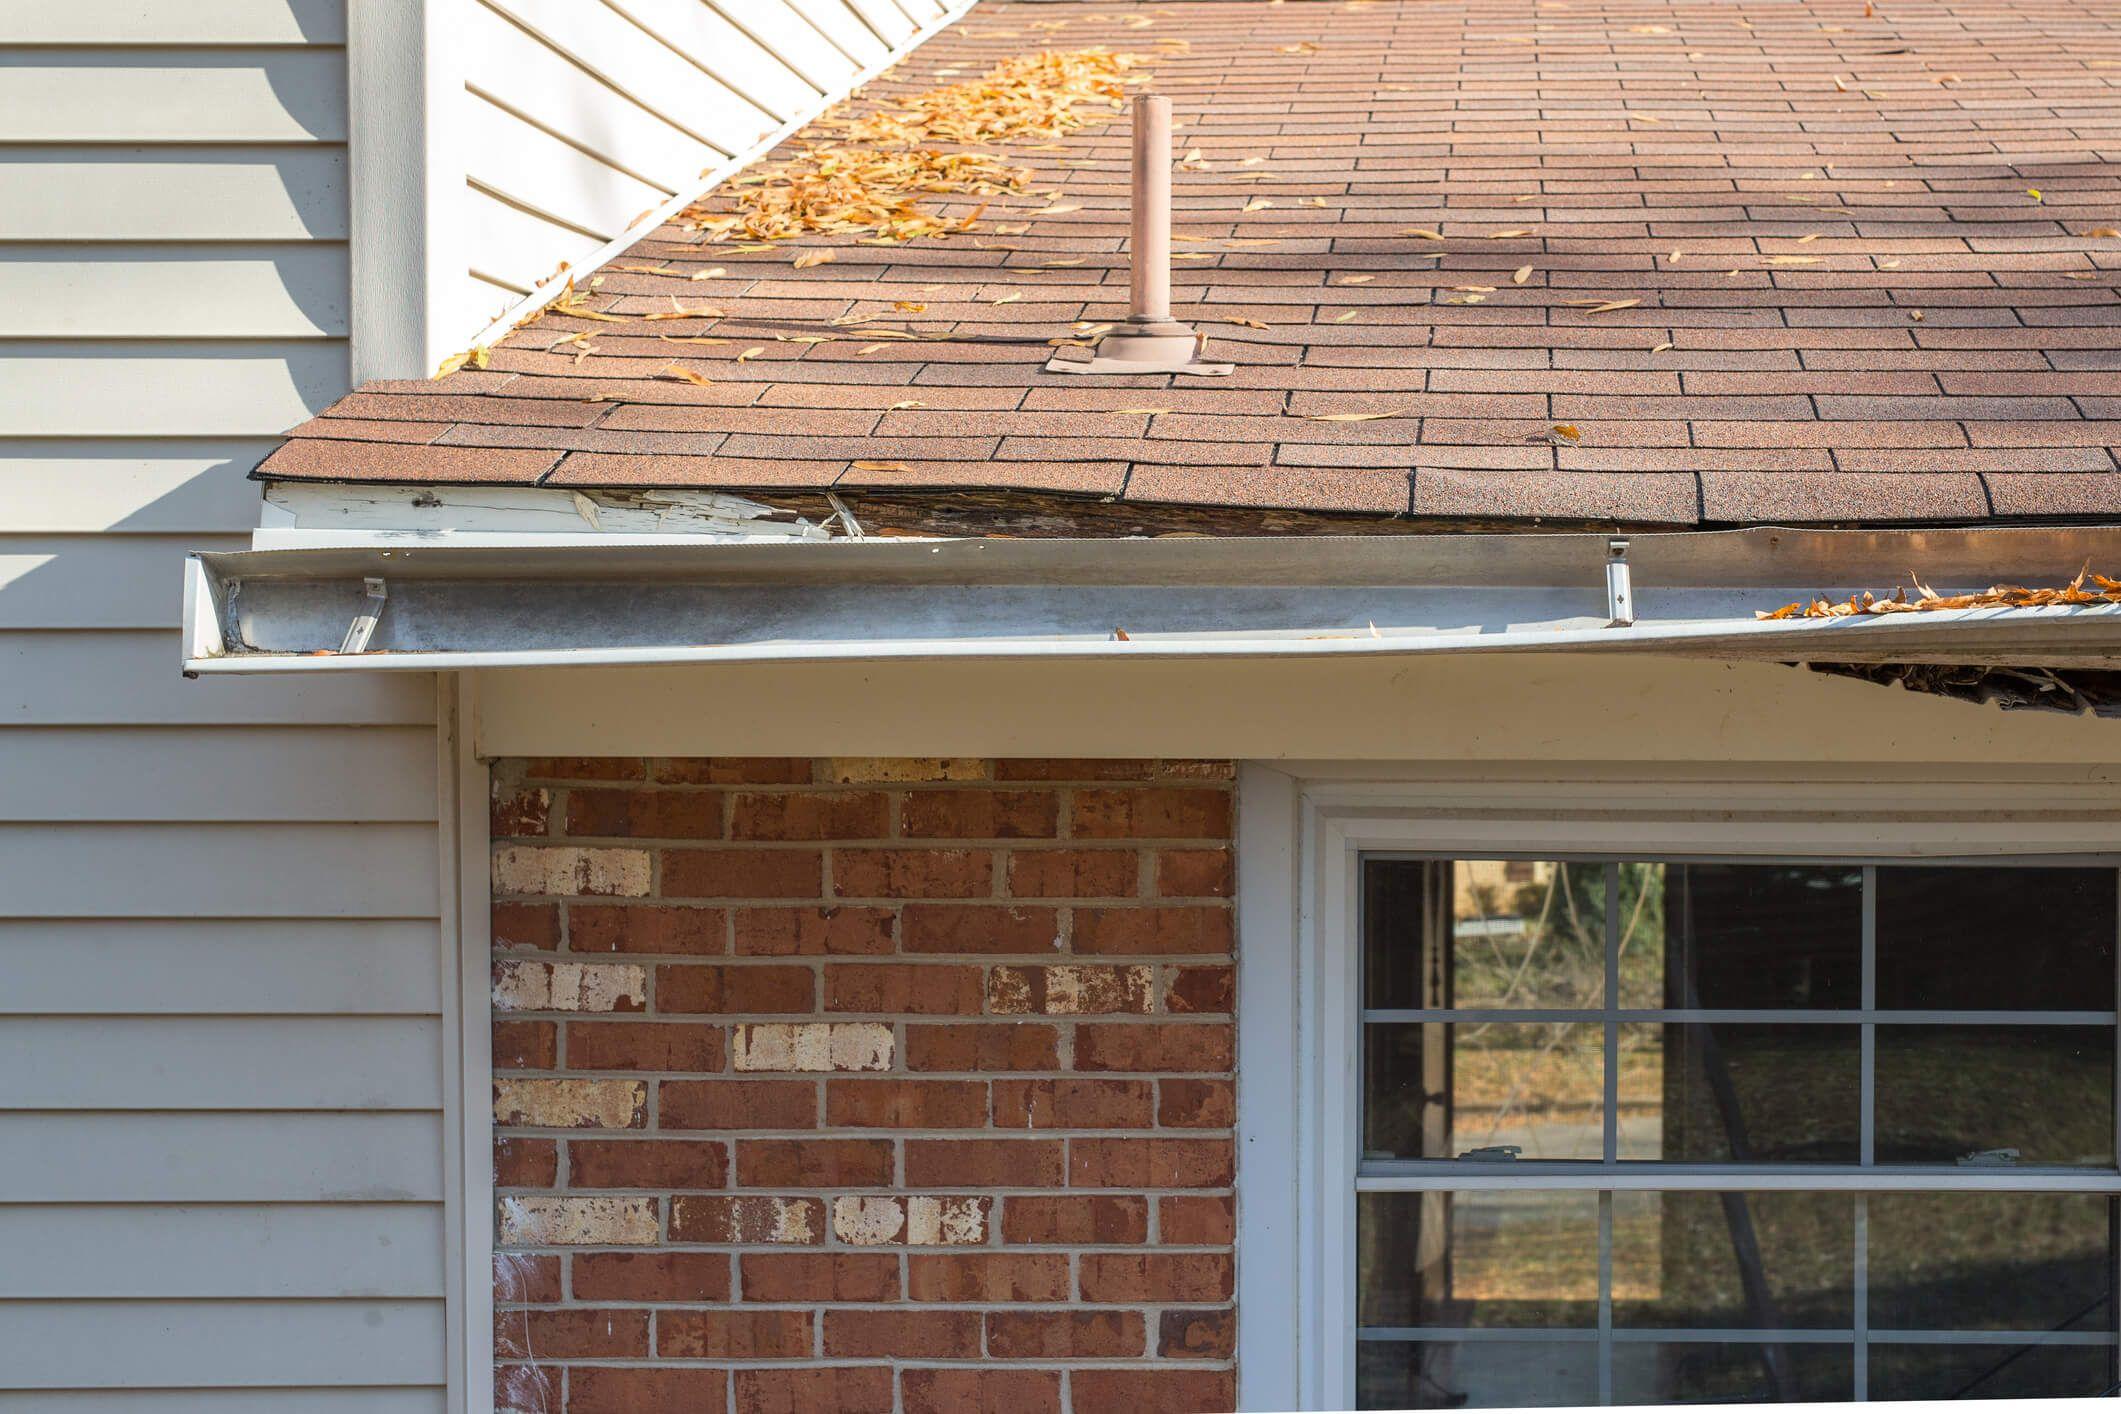 New Roof Installation Company Peachtree City Ga In 2020 How To Install Gutters Gutters Installation